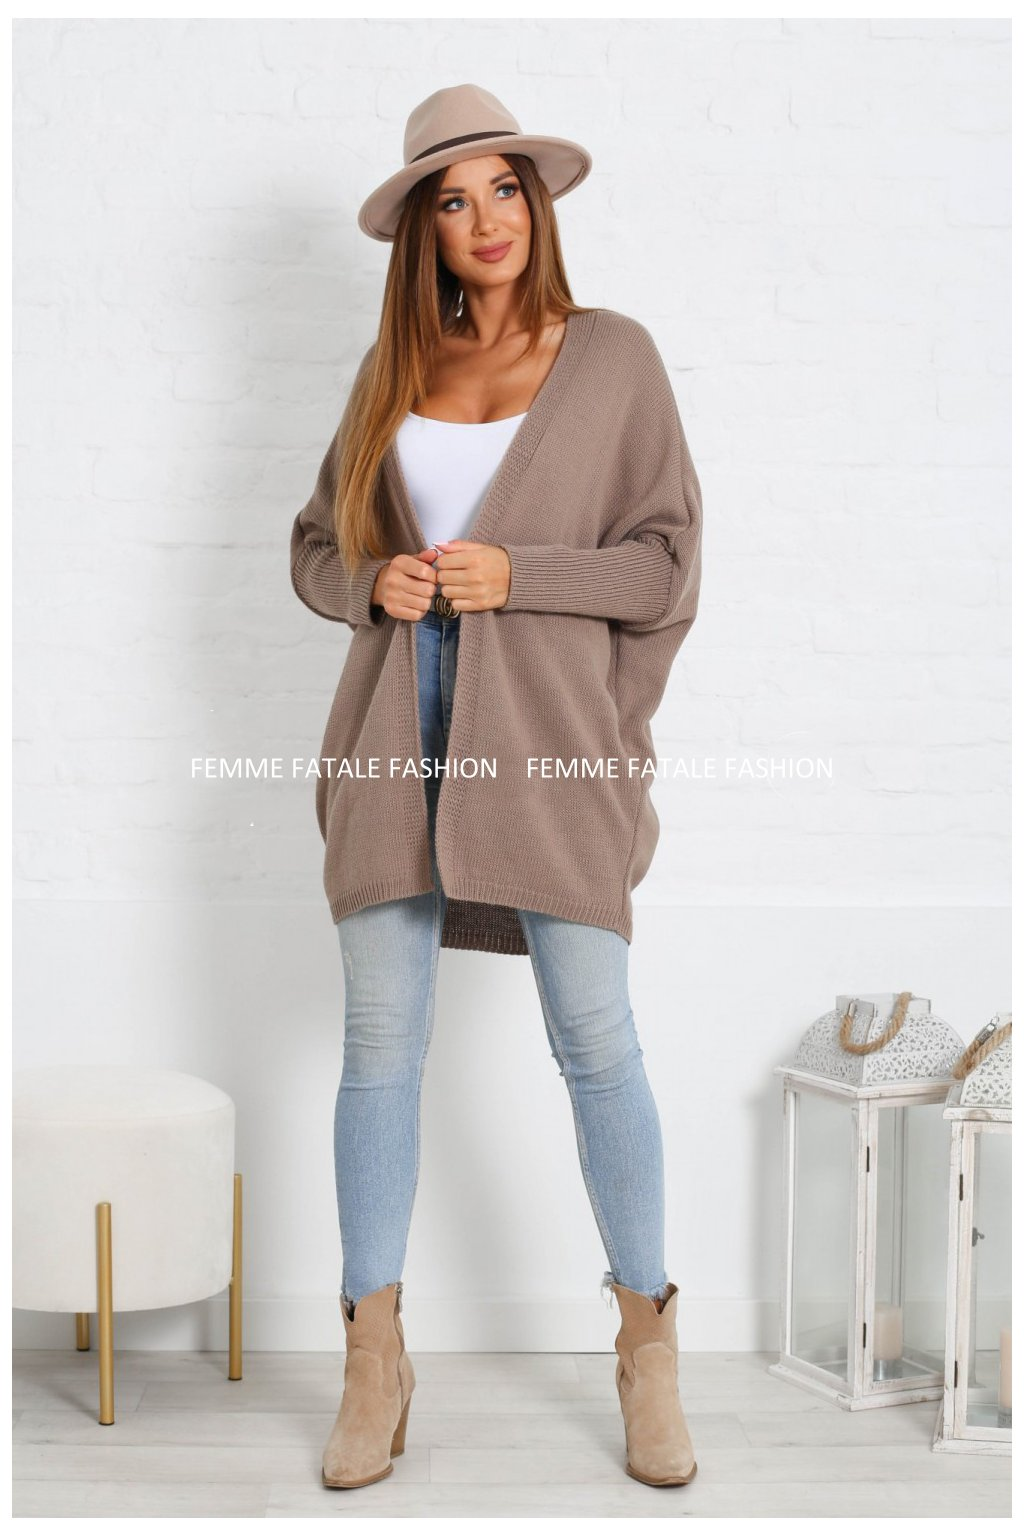 Dámský svetr kardigan VENISE femmefatalefashion (13)